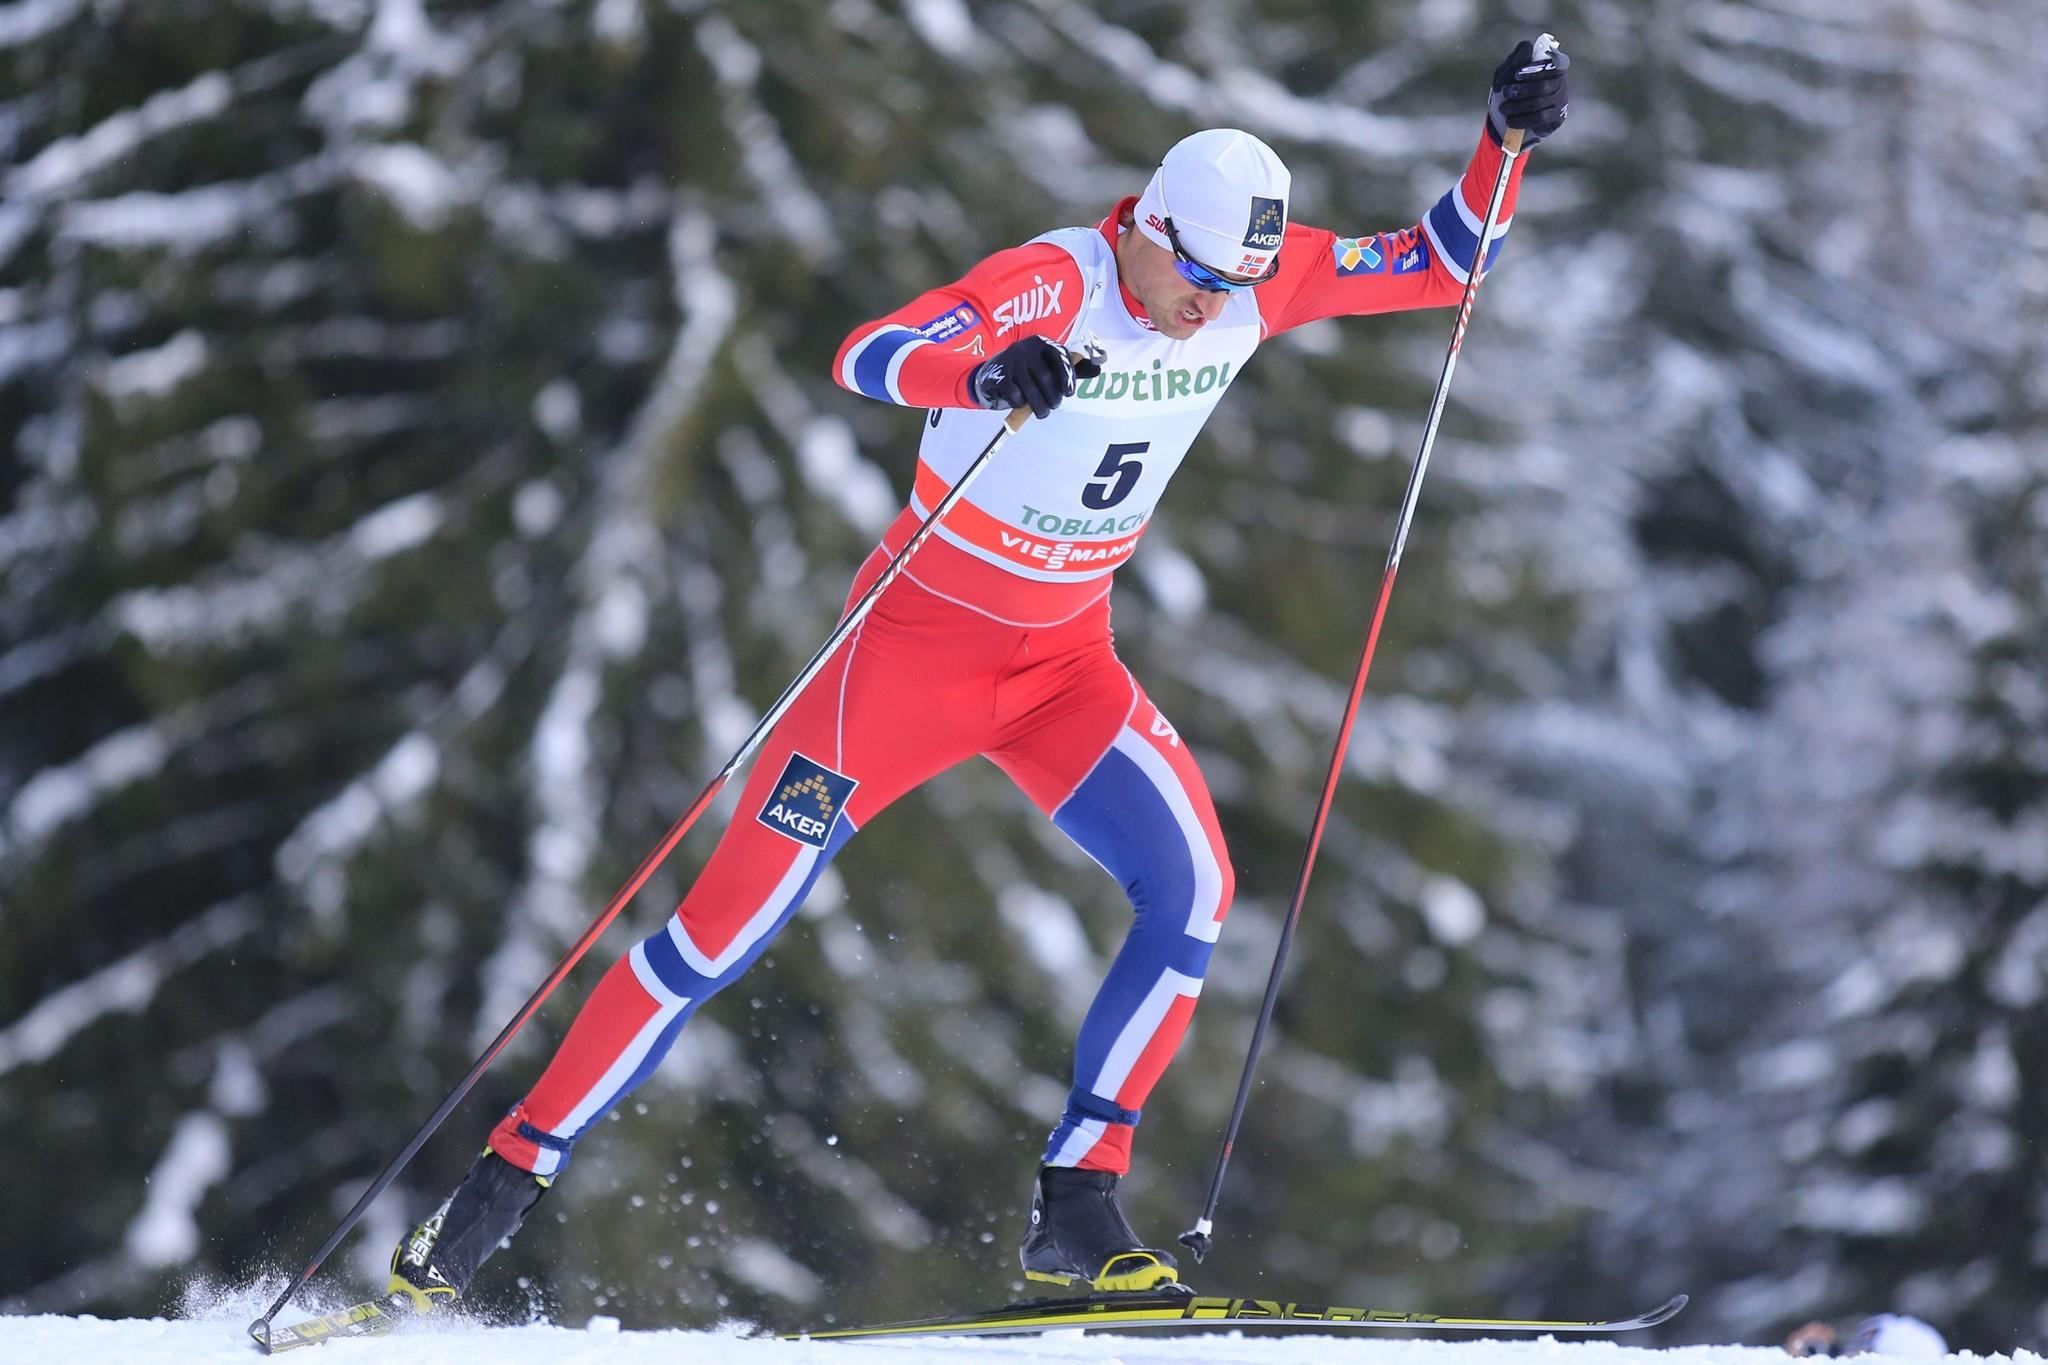 Norway's Petter Northug competes Dobbiaco, Toblach. (Pierre Teyssot/Getty Photo)